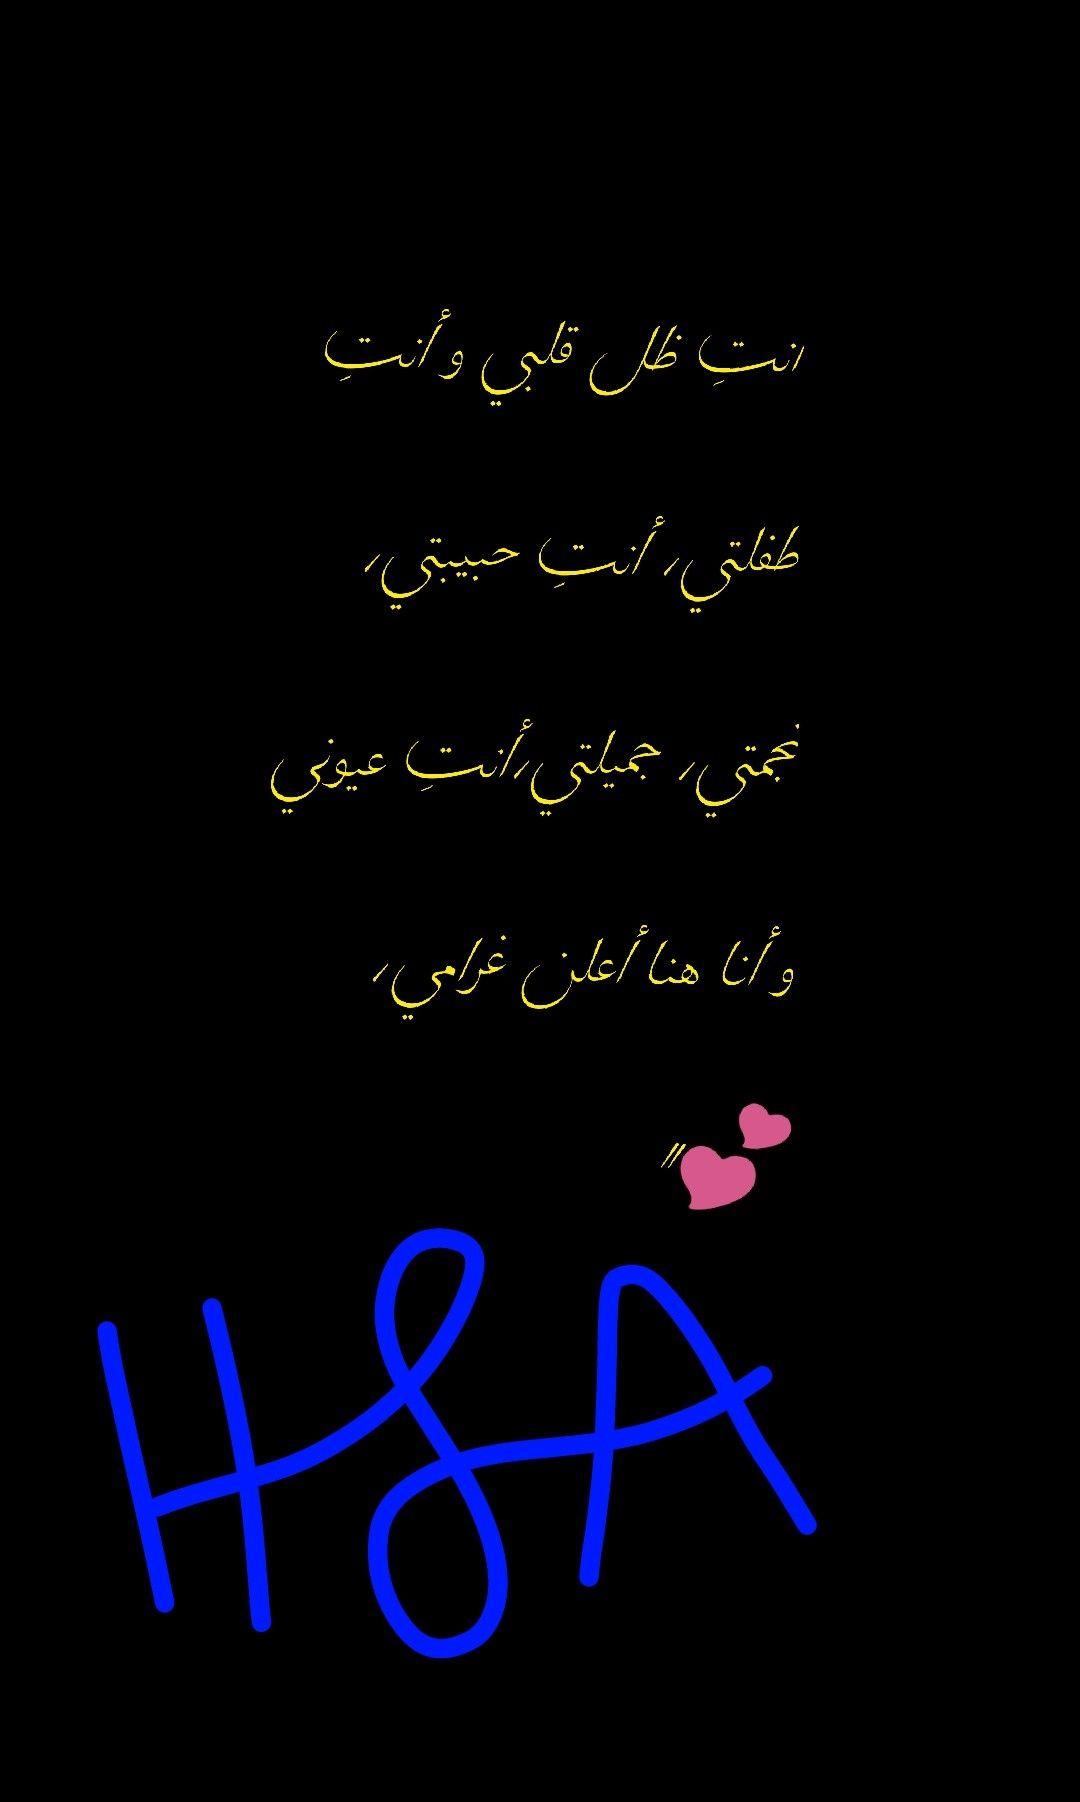 انت كل شي بلنسبه الي صرتي Arabic Calligraphy Calligraphy Hsa